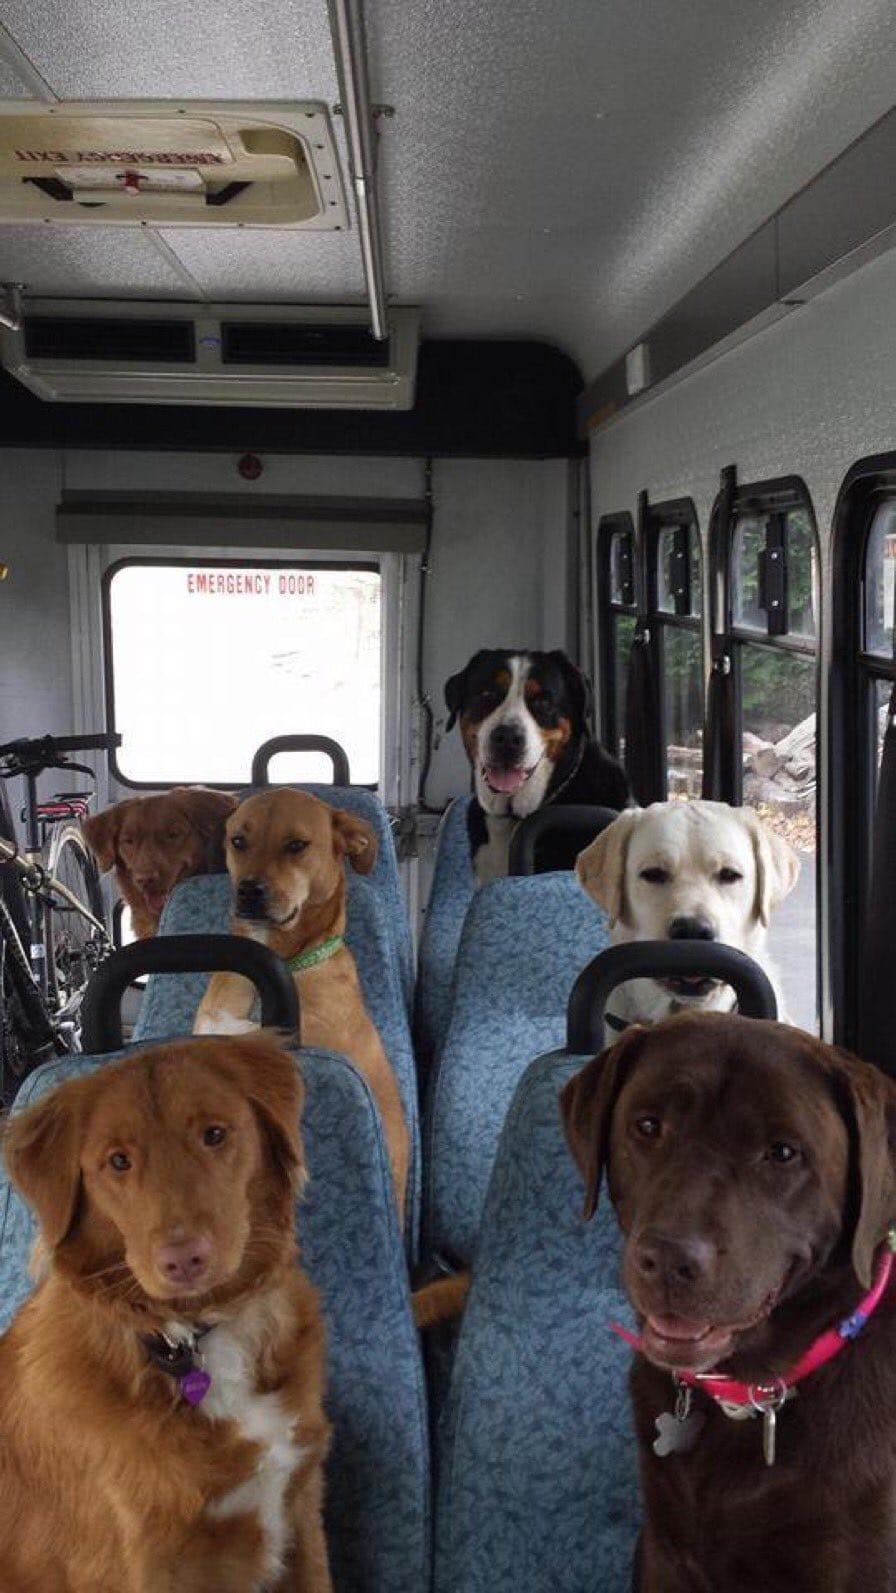 собаки едут в автобусе в школу в Канаде